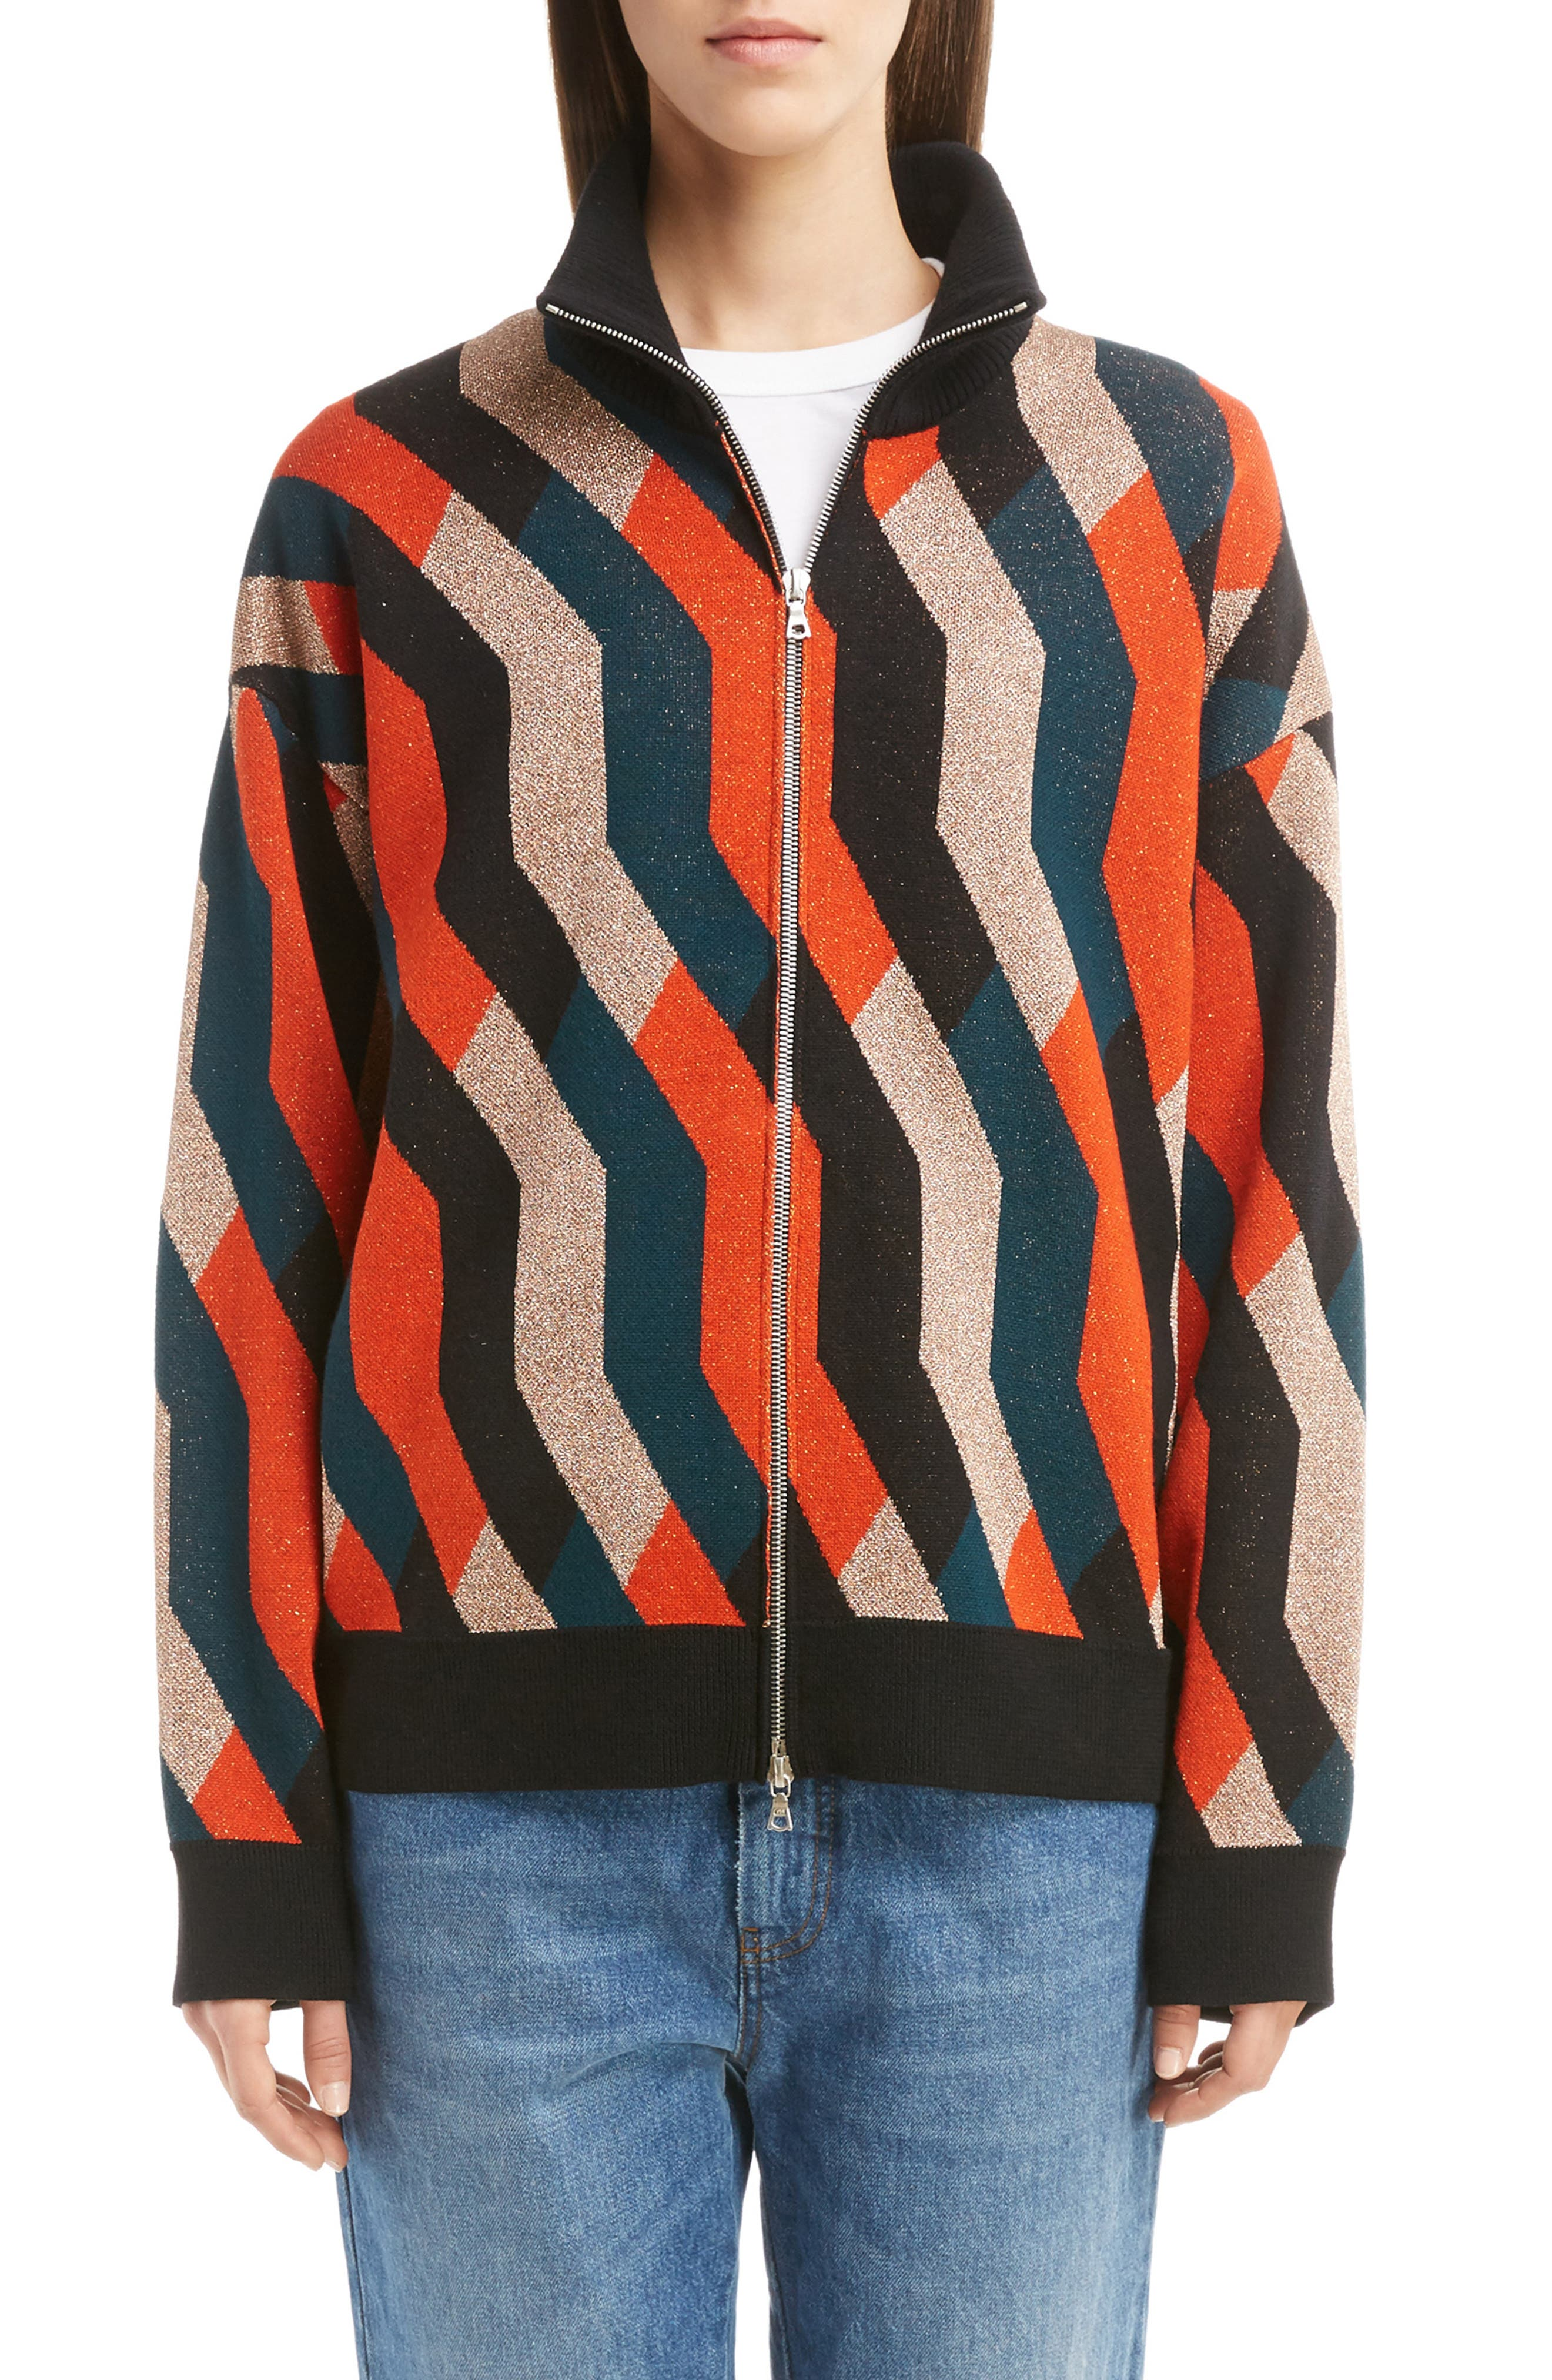 Alternate Image 1 Selected - Dries Van Noten Graphic Knit Merino Wool Cardigan